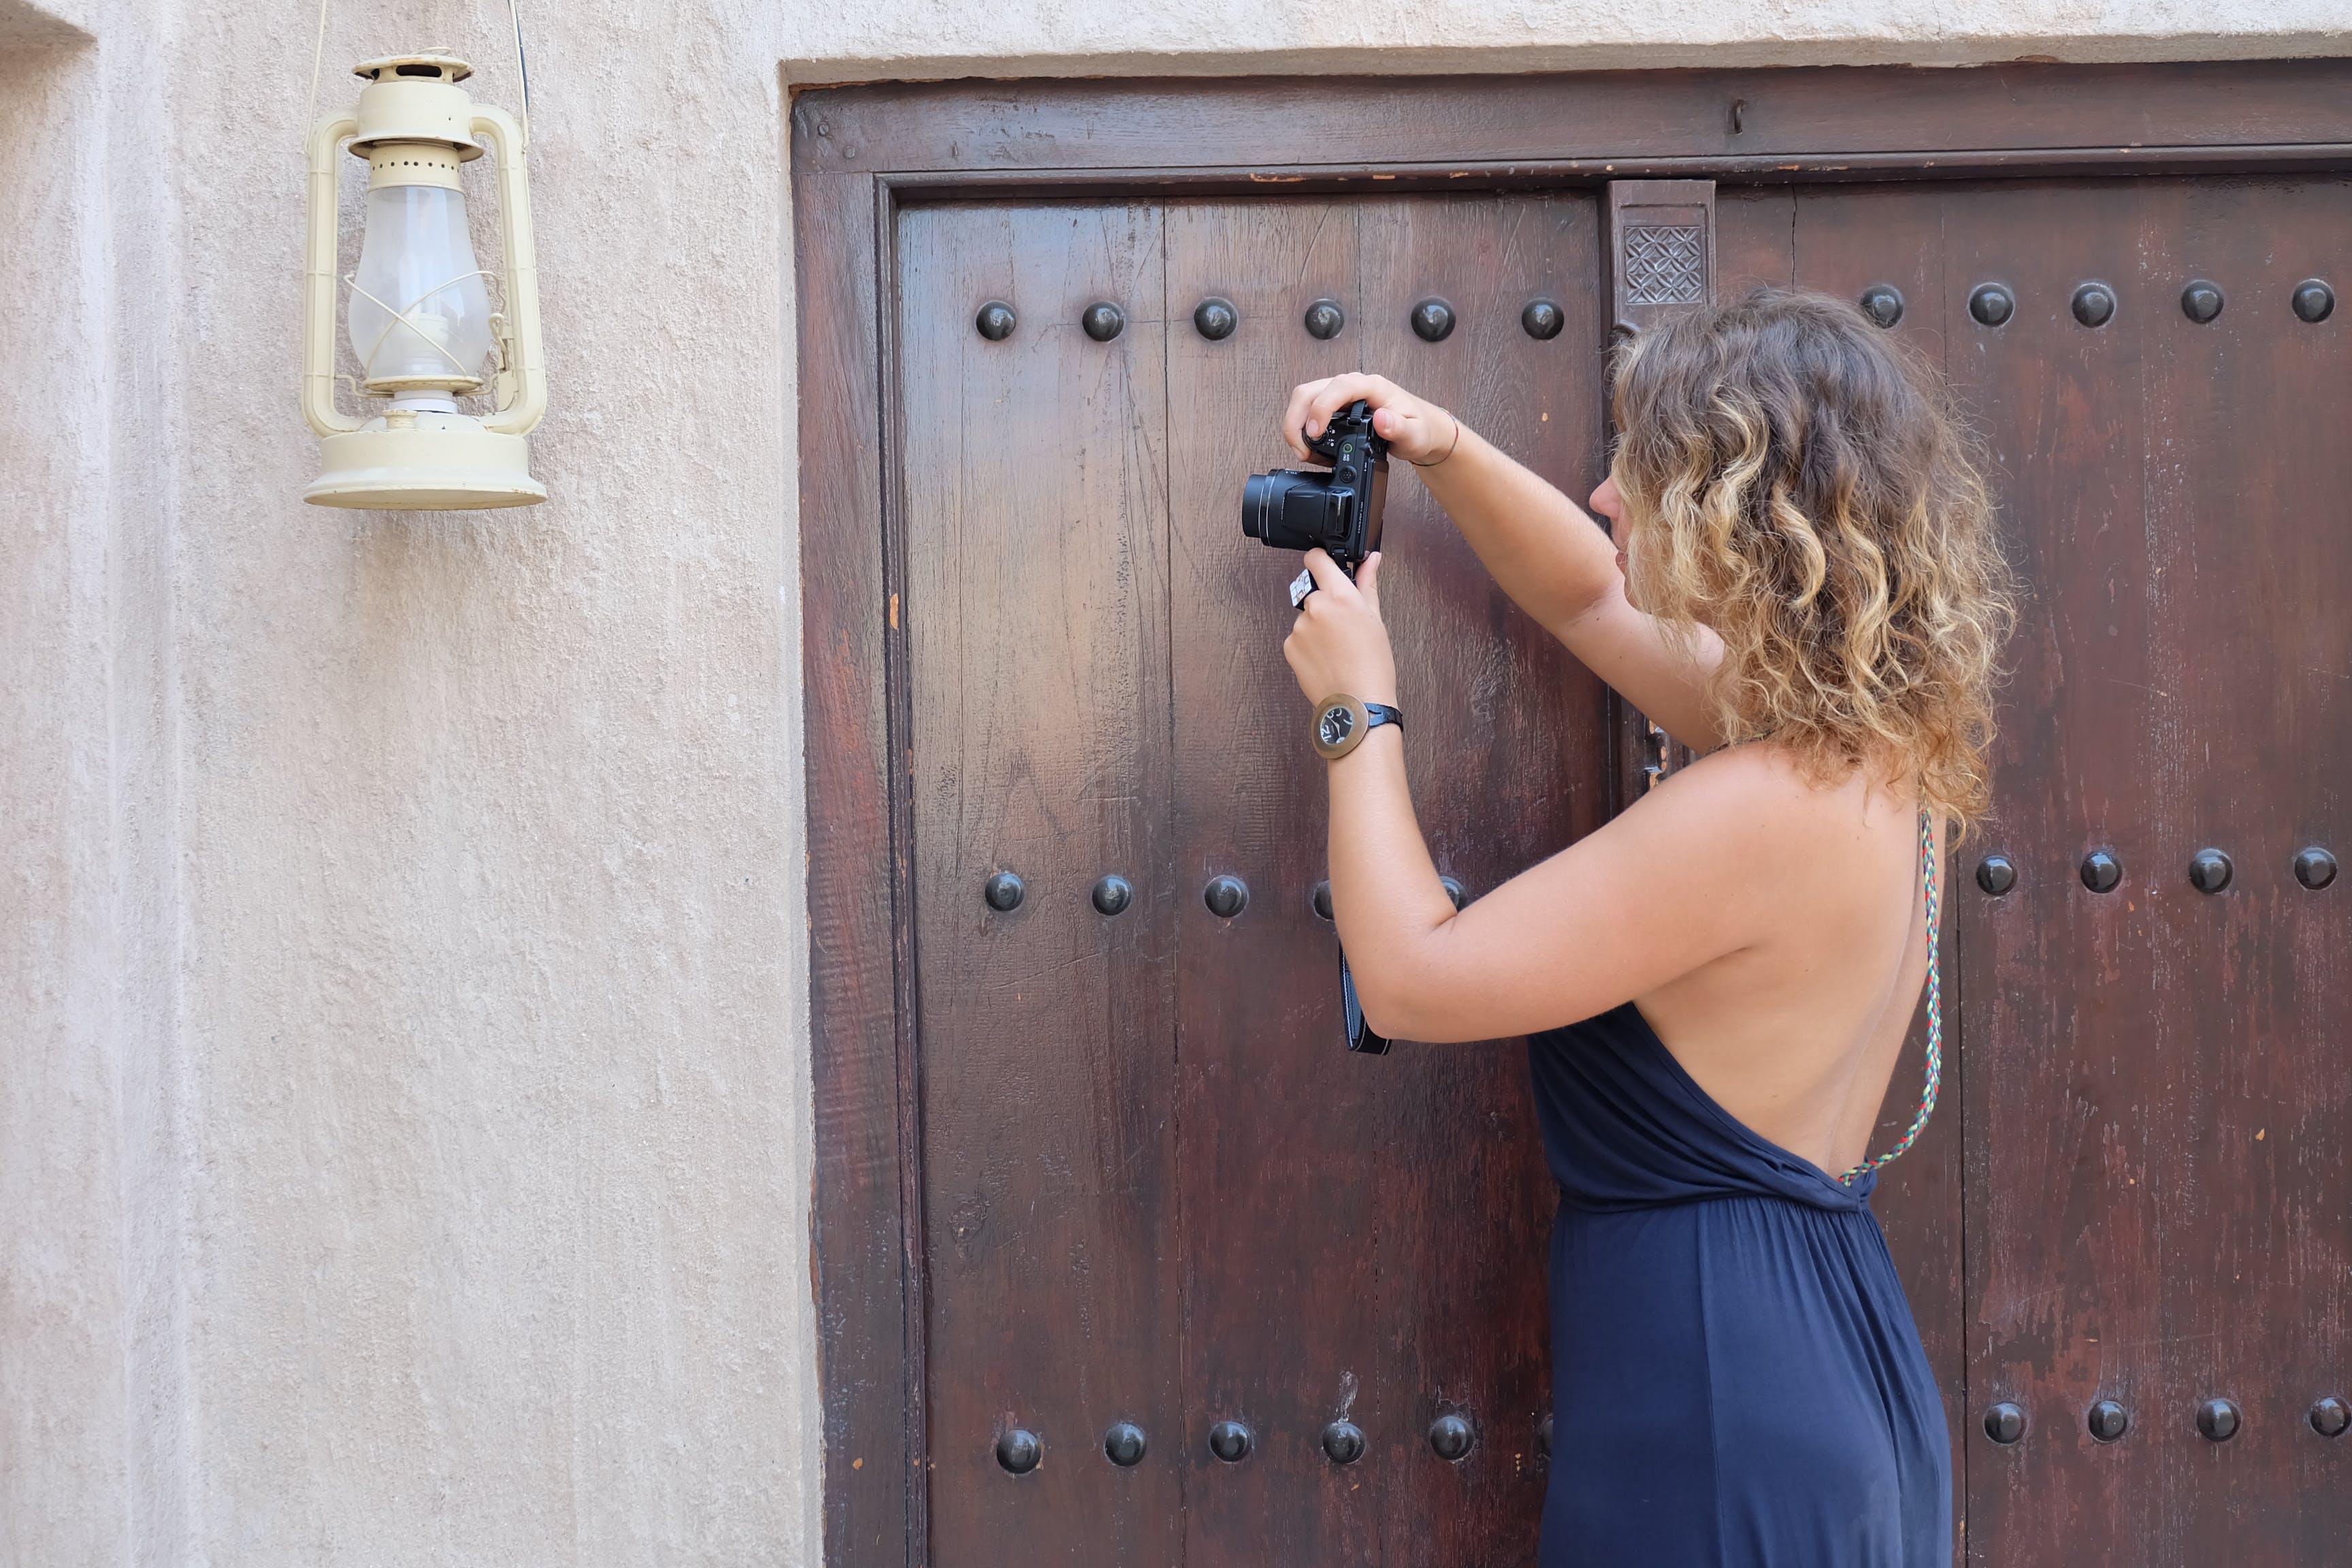 Woman Taking a Photo of Kerosene Lantern Hanged on Wall